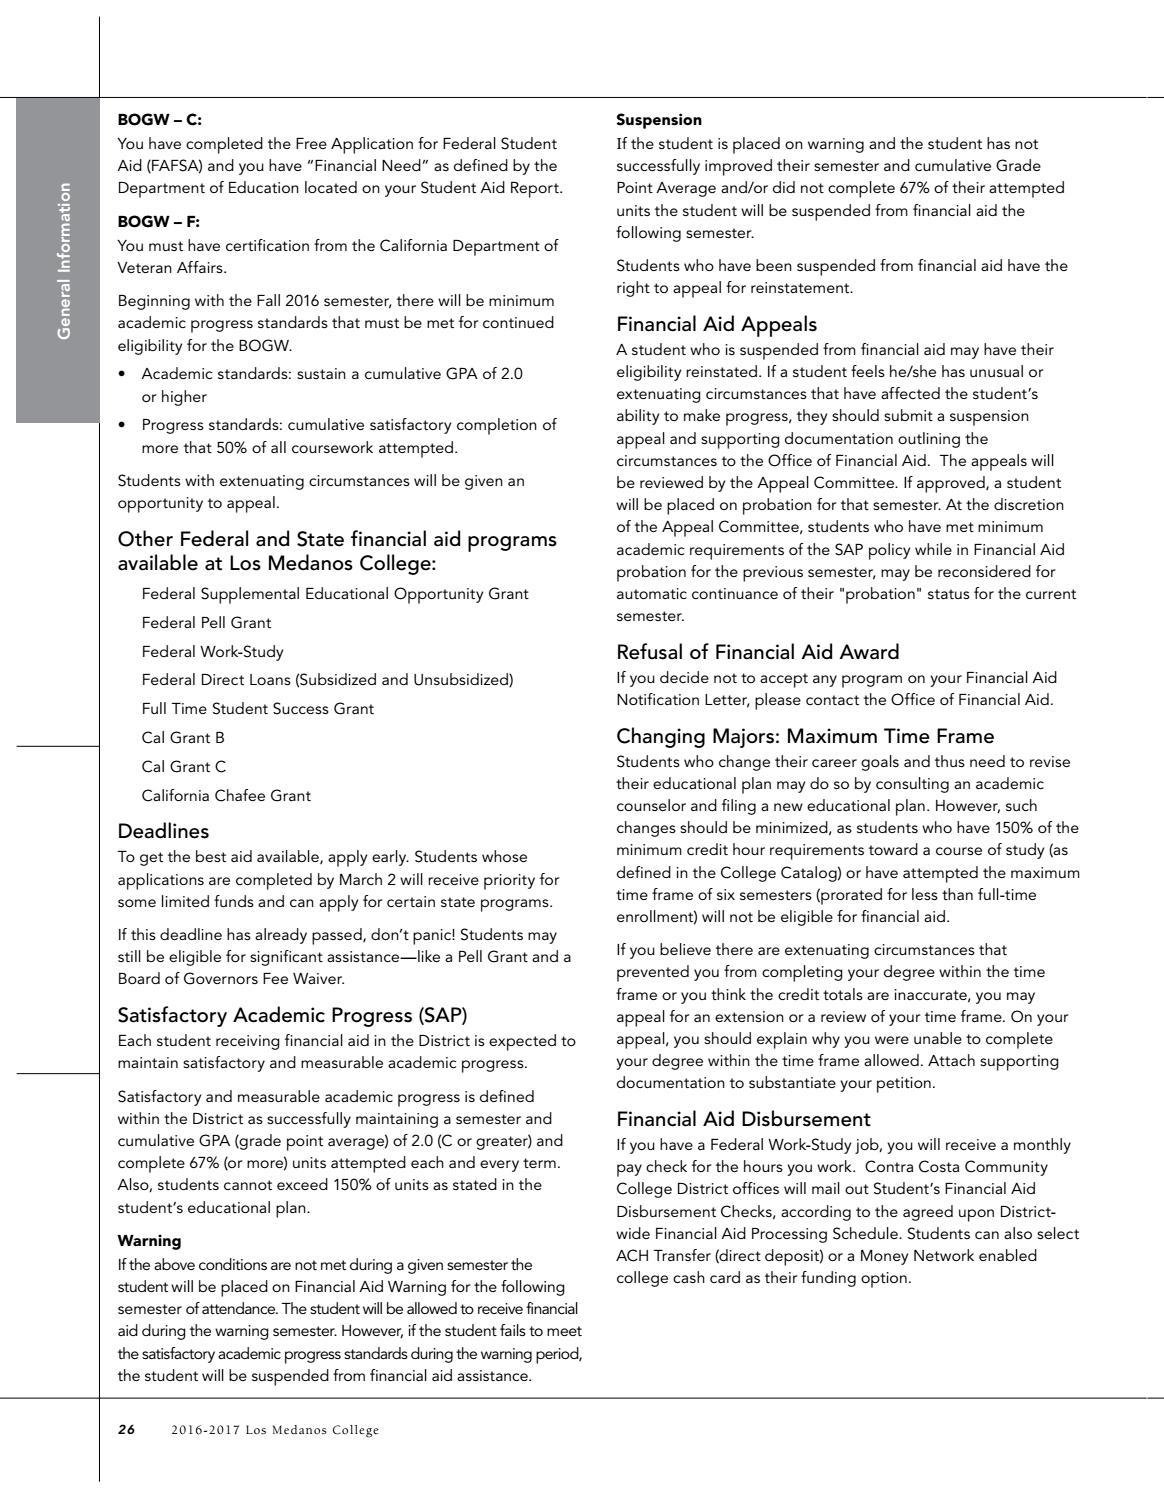 LMC 2016-17 College Catalog by Los Medanos College - issuu